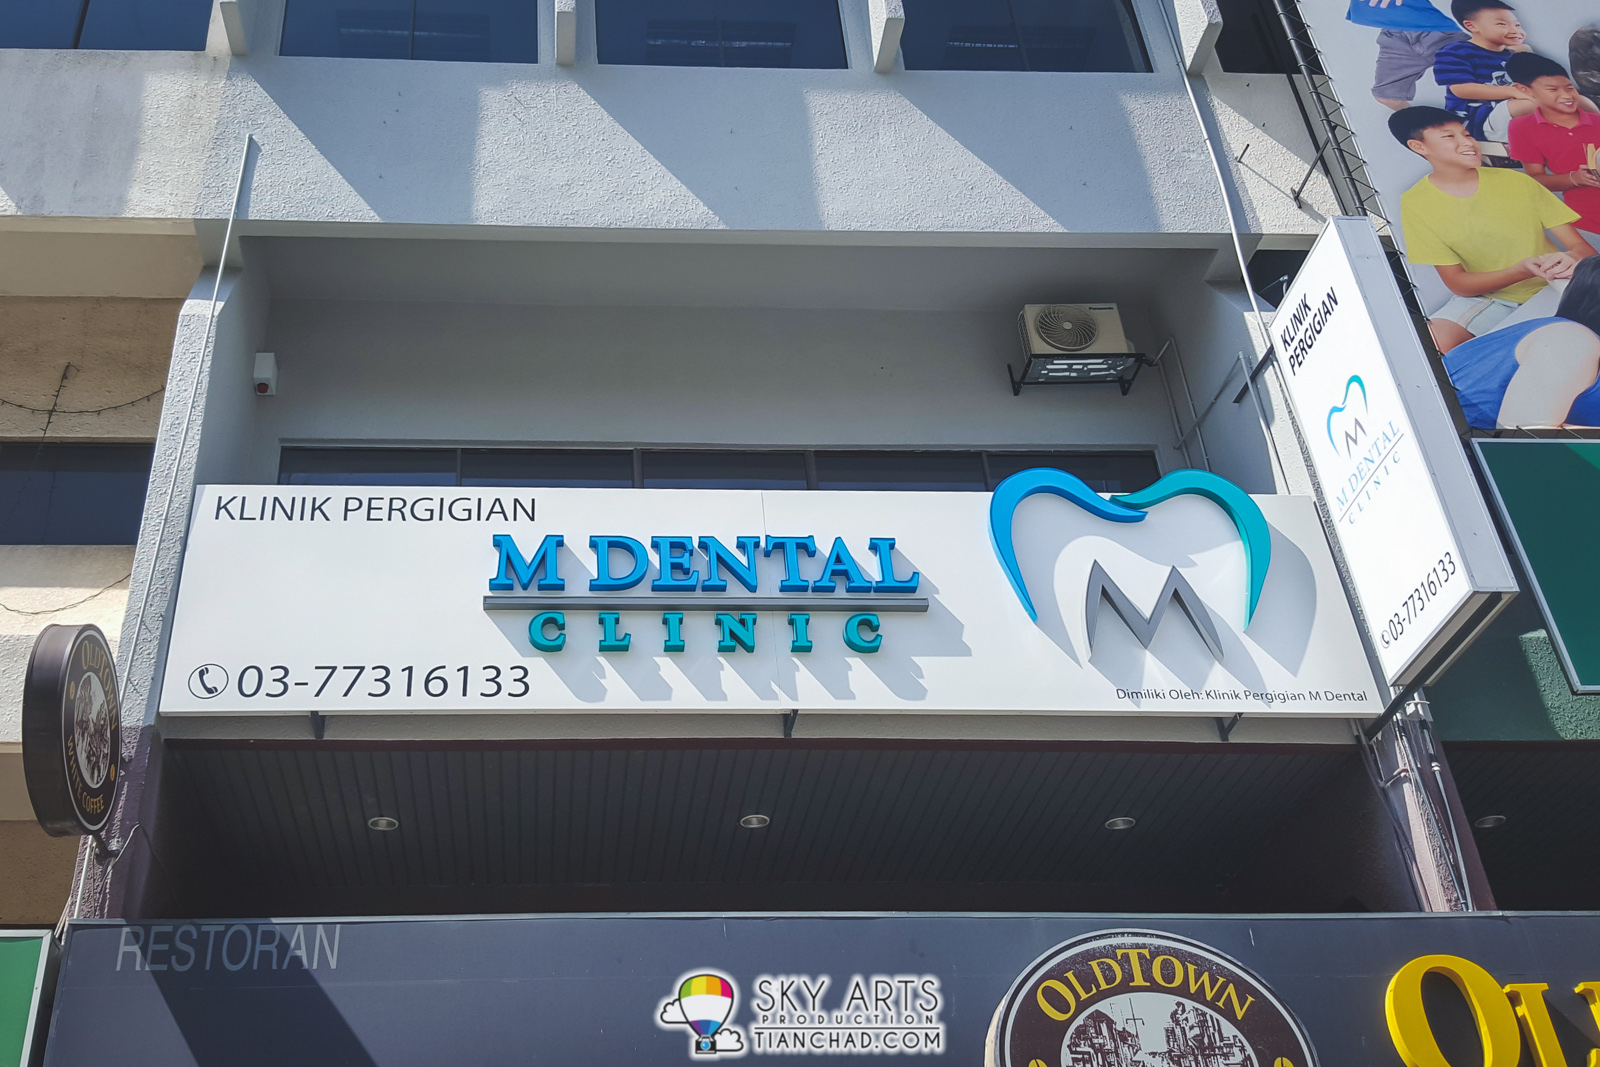 M Dental Clinic Damansara Utama Address